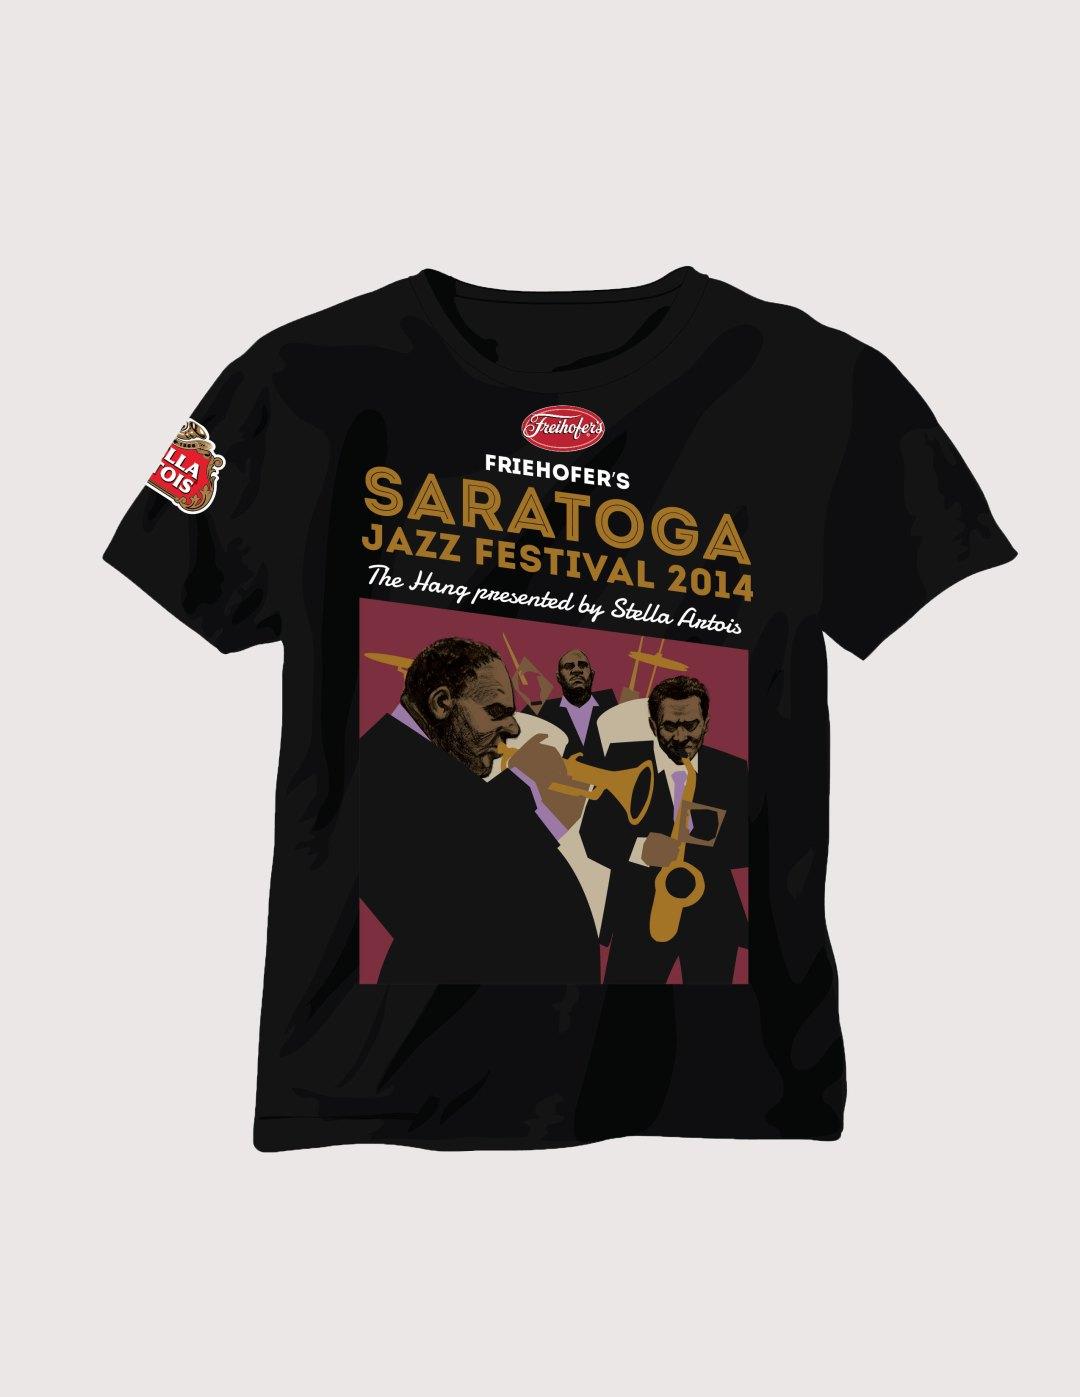 Saratoga Jazz Festival T-Shirt